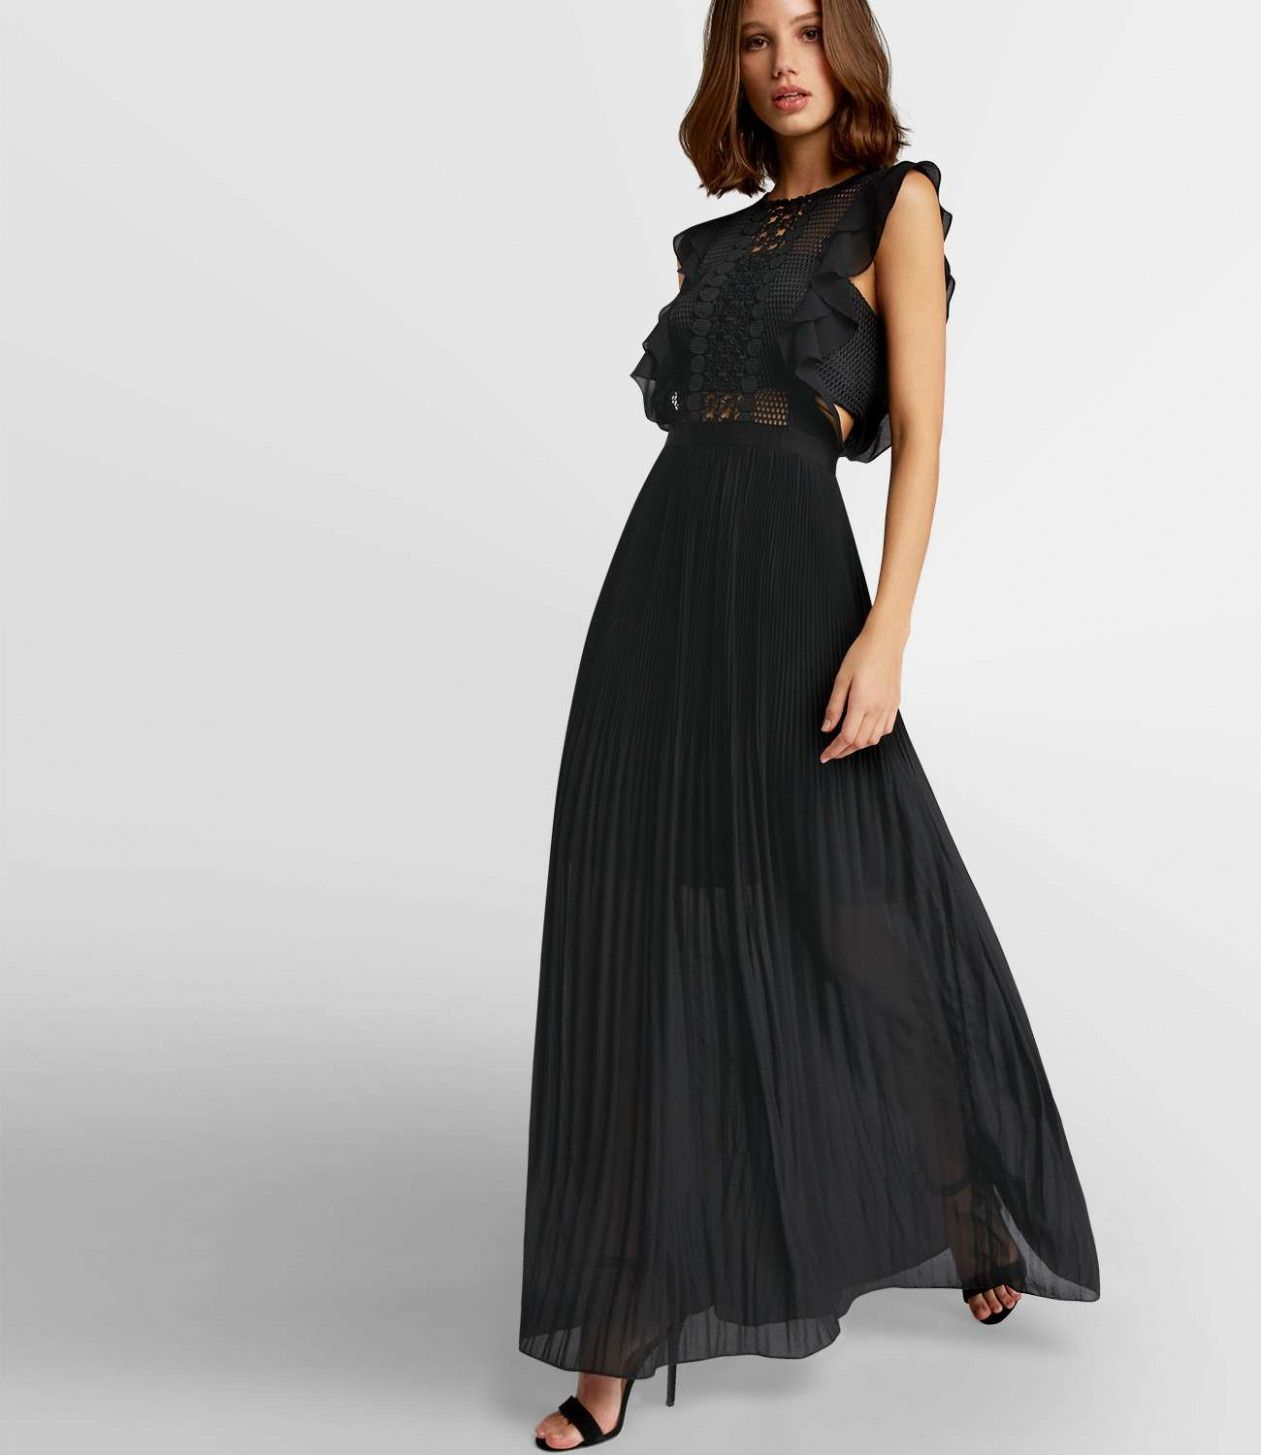 12 Langes Schwarzes Abendkleid in 2020 | Abendkleid ...